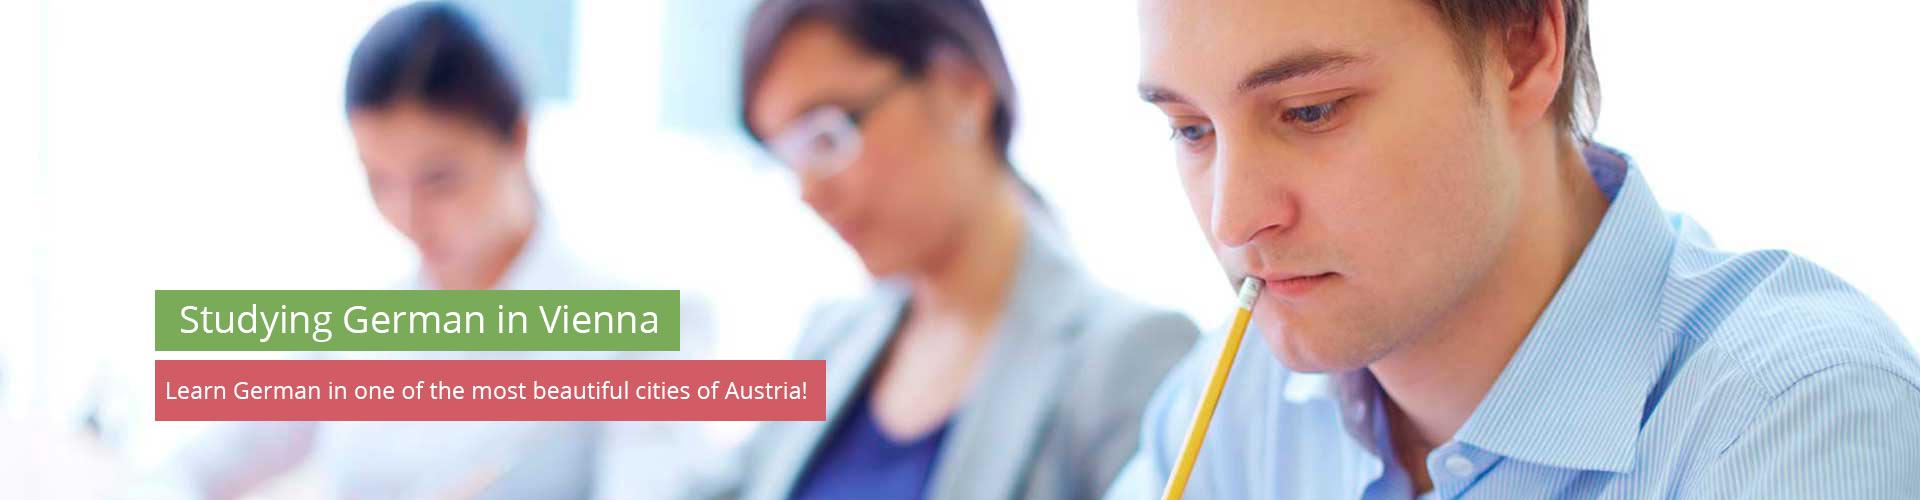 German courses in Vienna – German language school in Austria